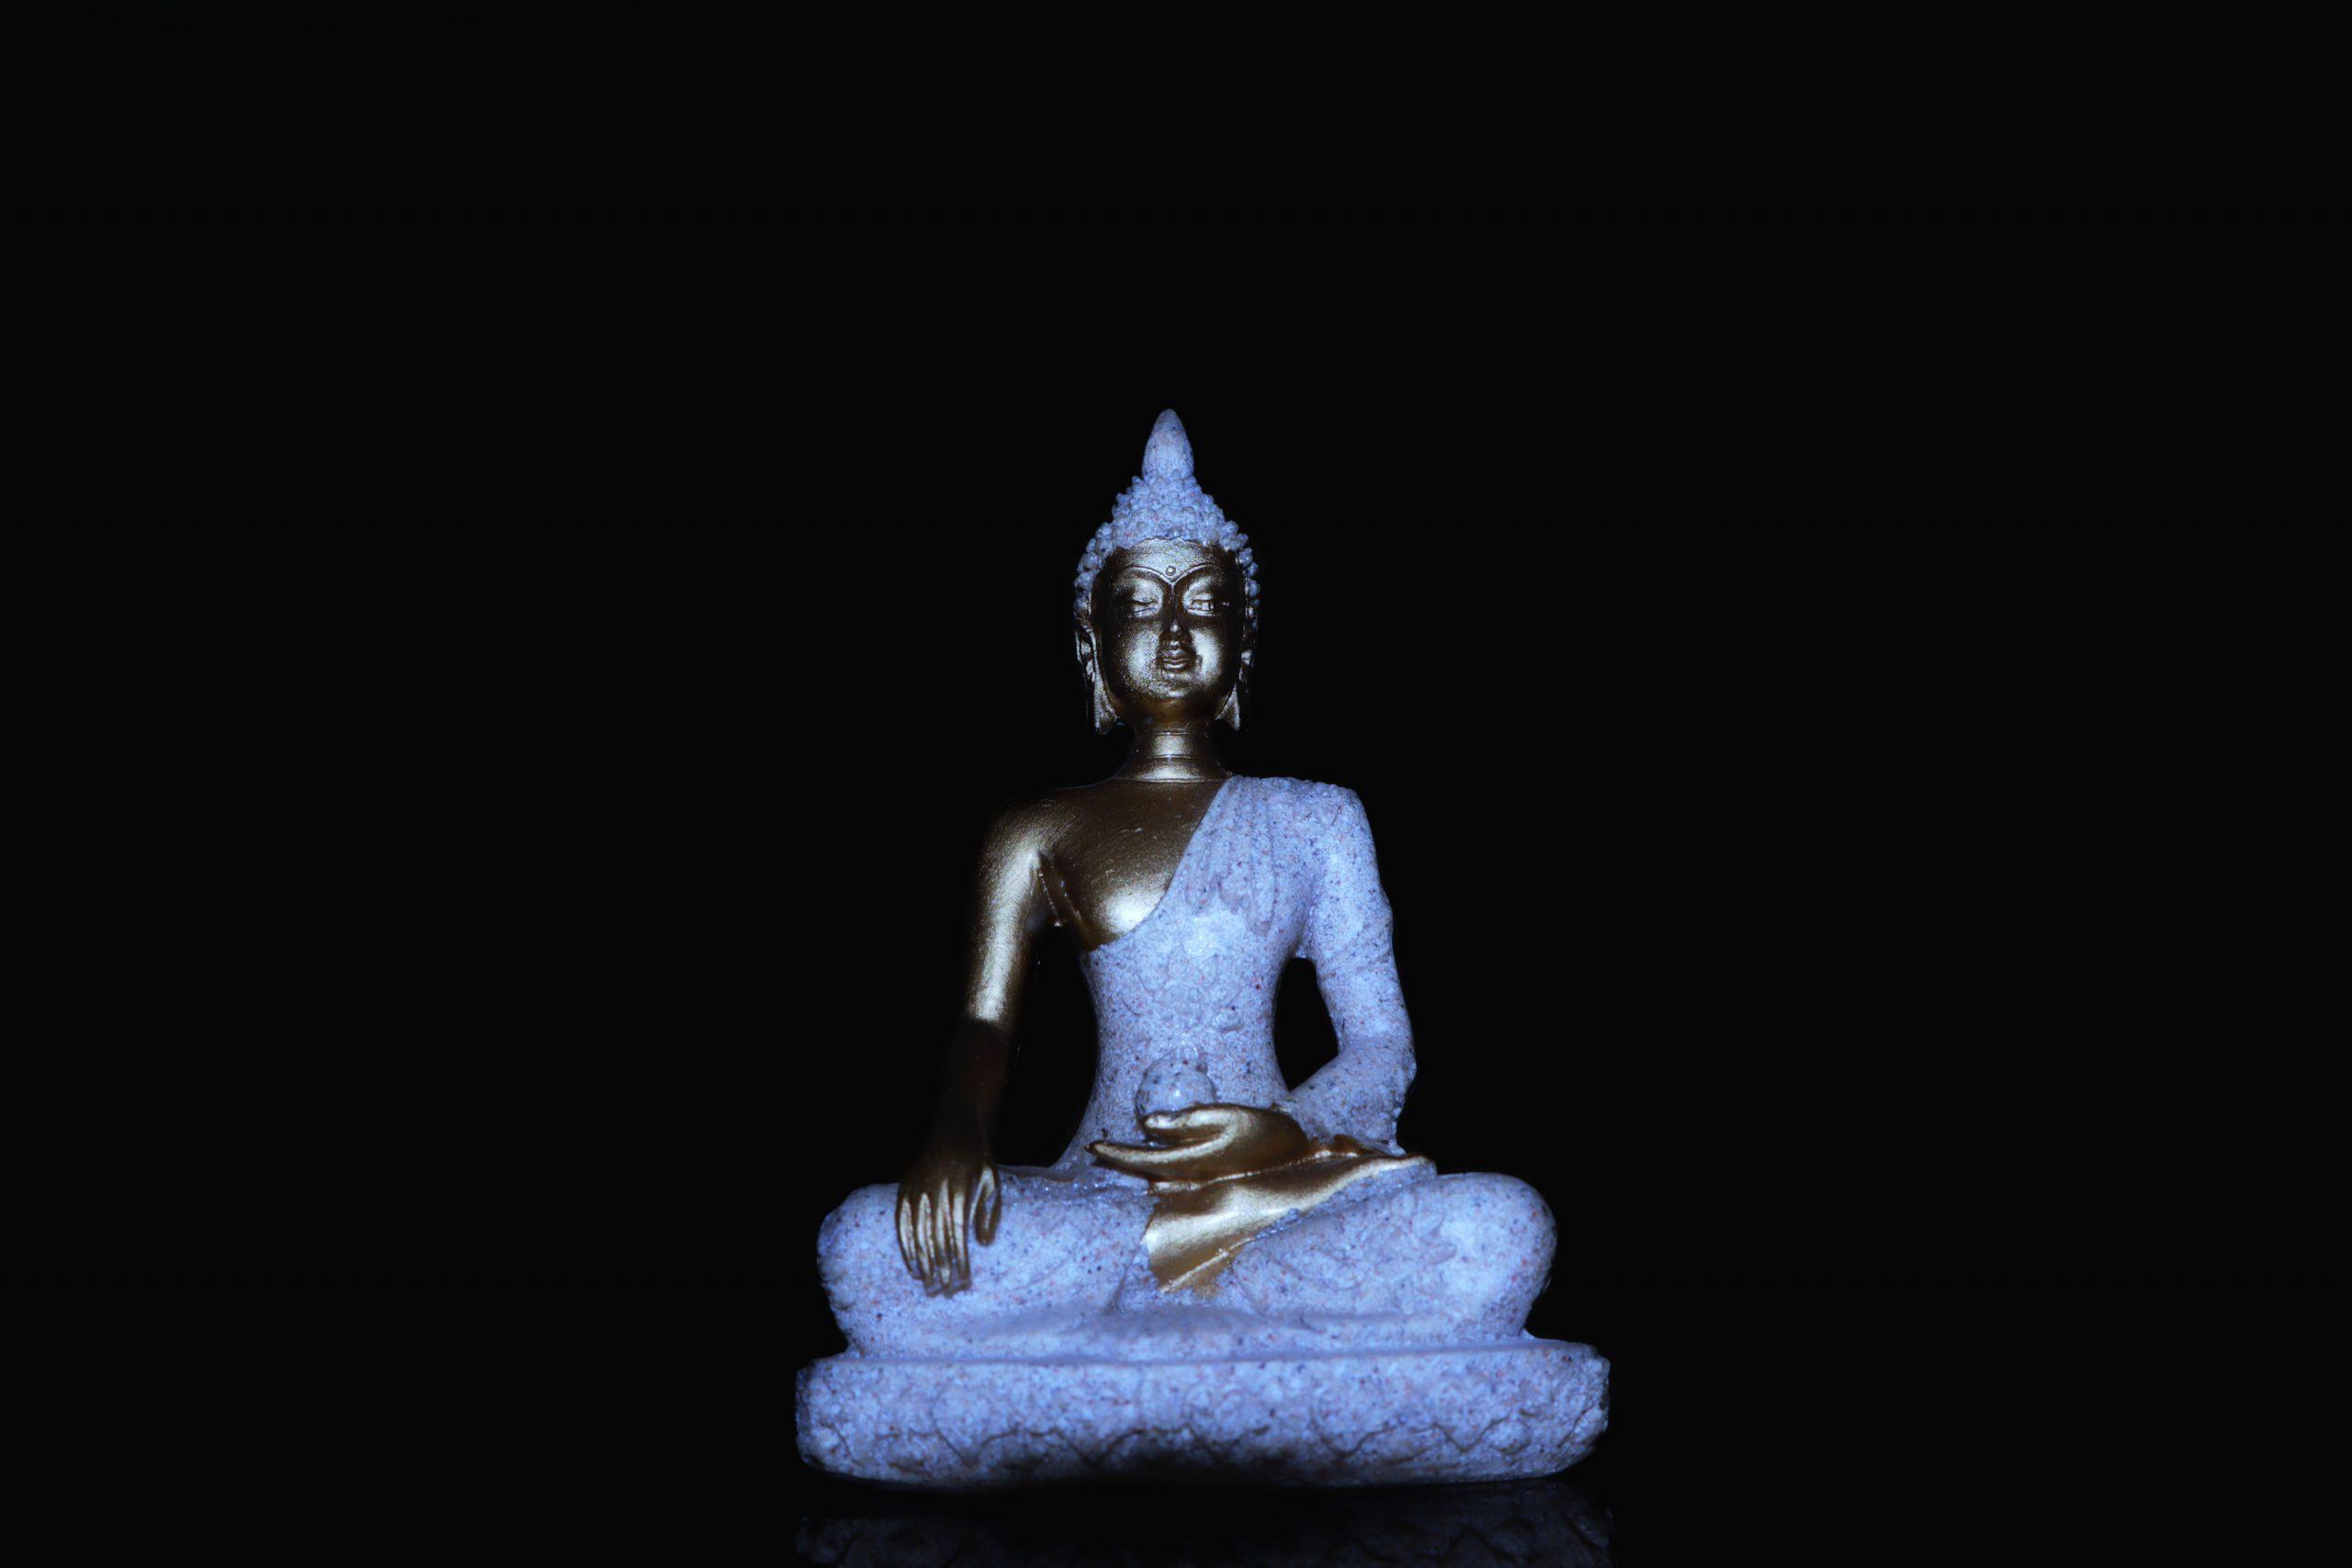 Gautama buddha statue on black background